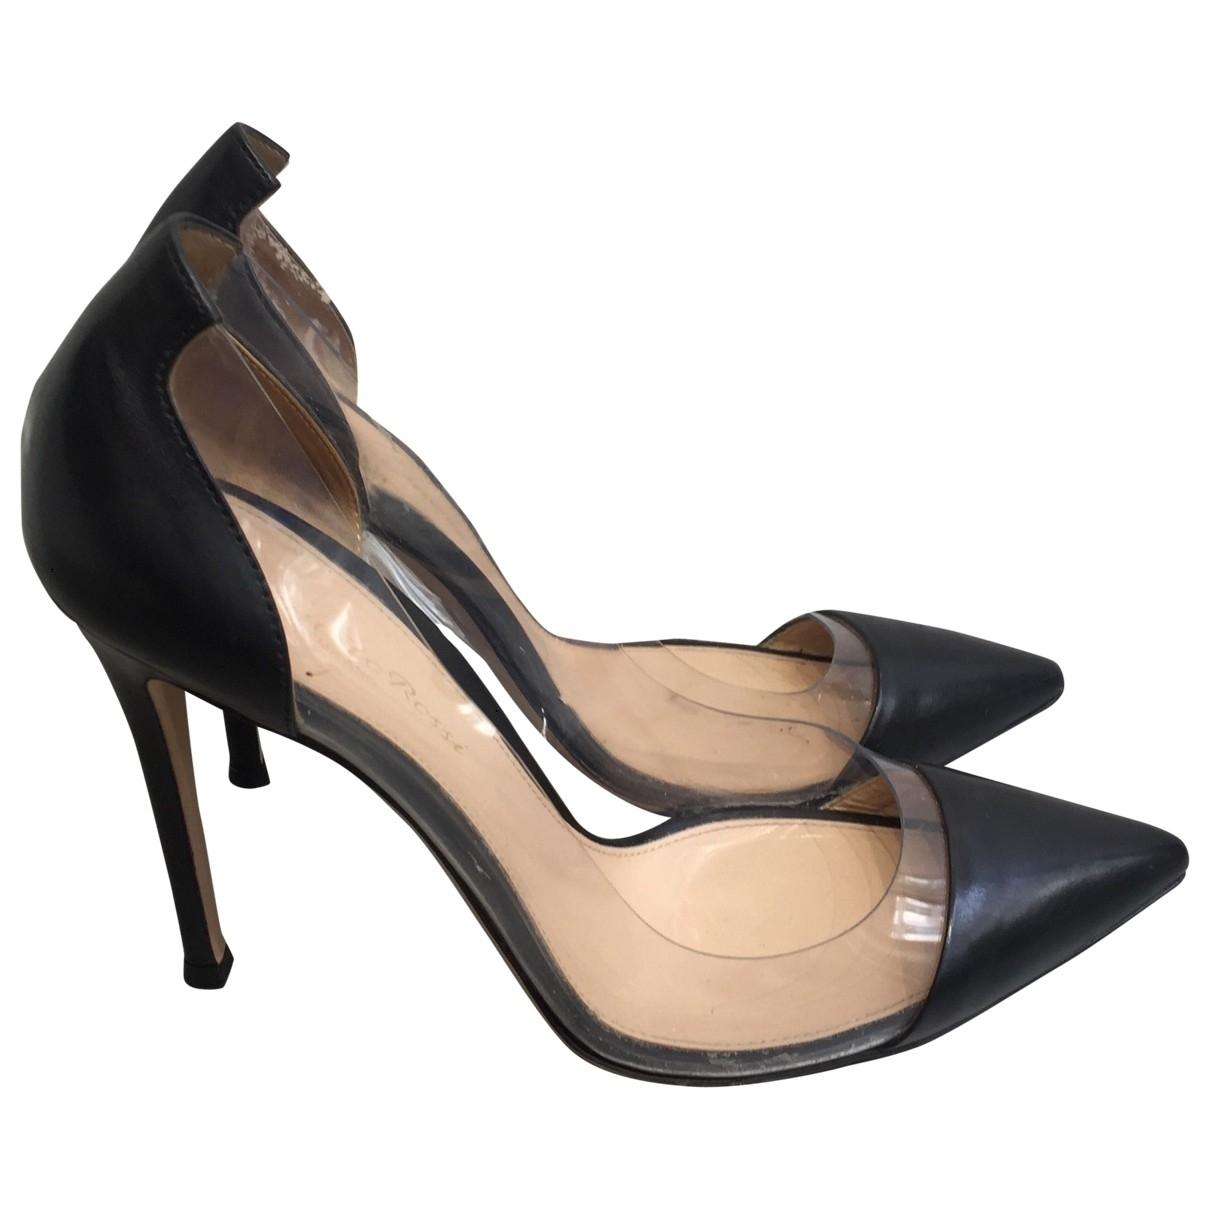 Gianvito Rossi - Escarpins Plexi pour femme en cuir - noir